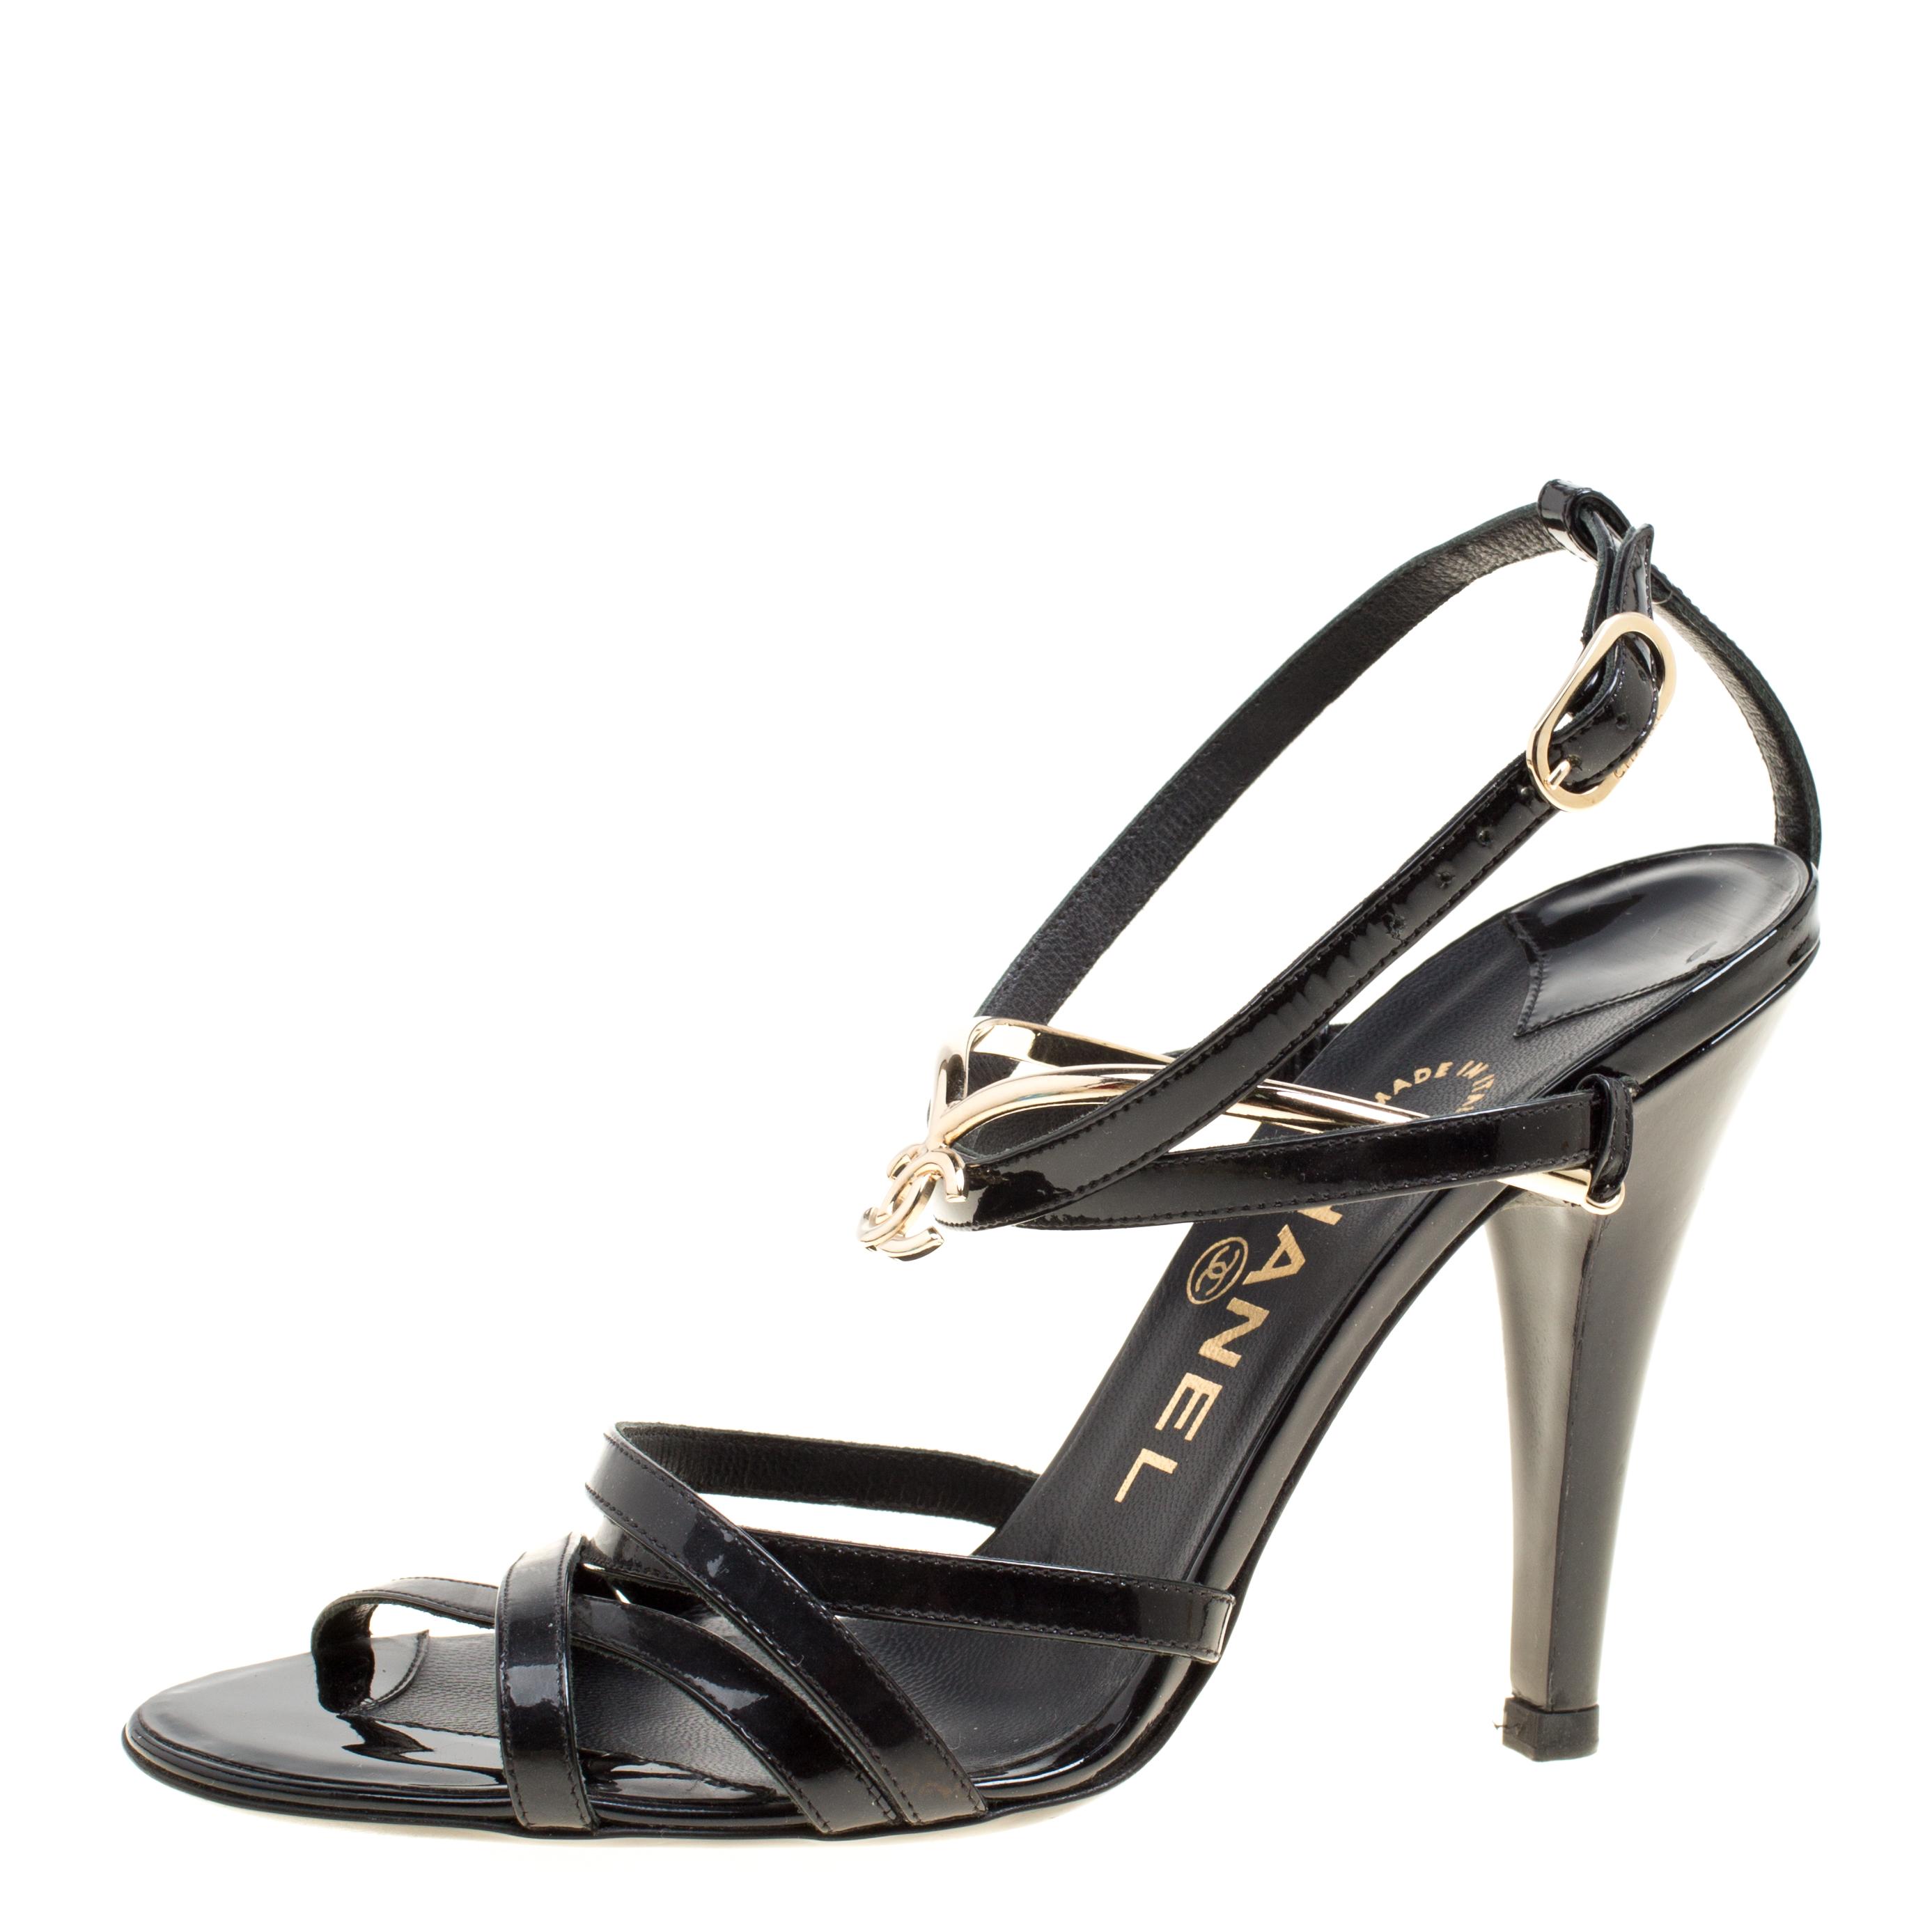 33532f0736043 ... Chanel Black Patent Leather Strappy Sandals Size 36. nextprev. prevnext